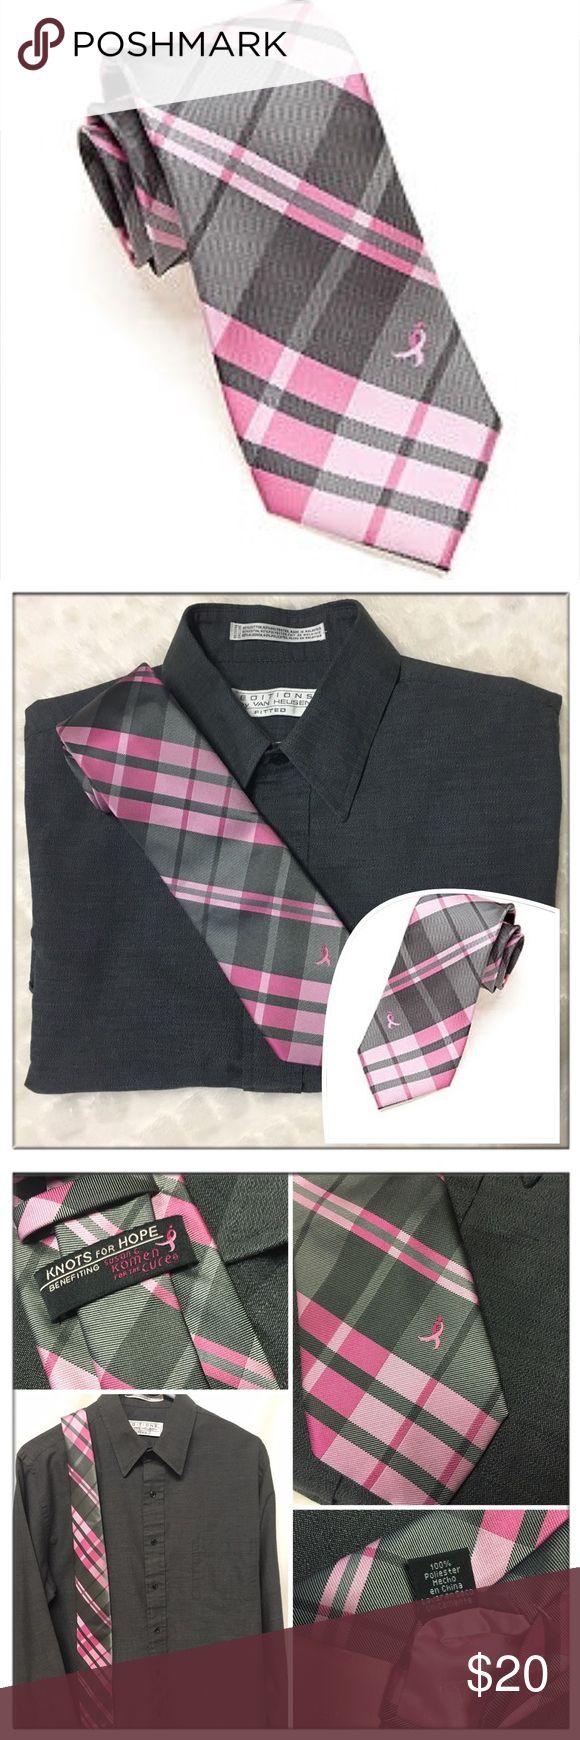 "🆕SUSAN G KOMEN ""Knots for Hope""🎗 Awareness tie SUSAN G KOMEN ""Knots for Hope""🎗 Pink & gray striped Cancer Awareness necktie. NIP Length-18""x3"" at widest part. Shirt sold separately in my closet. MSRP $40.00 Reasonable offers welcome. Susan G Komen Accessories Ties"